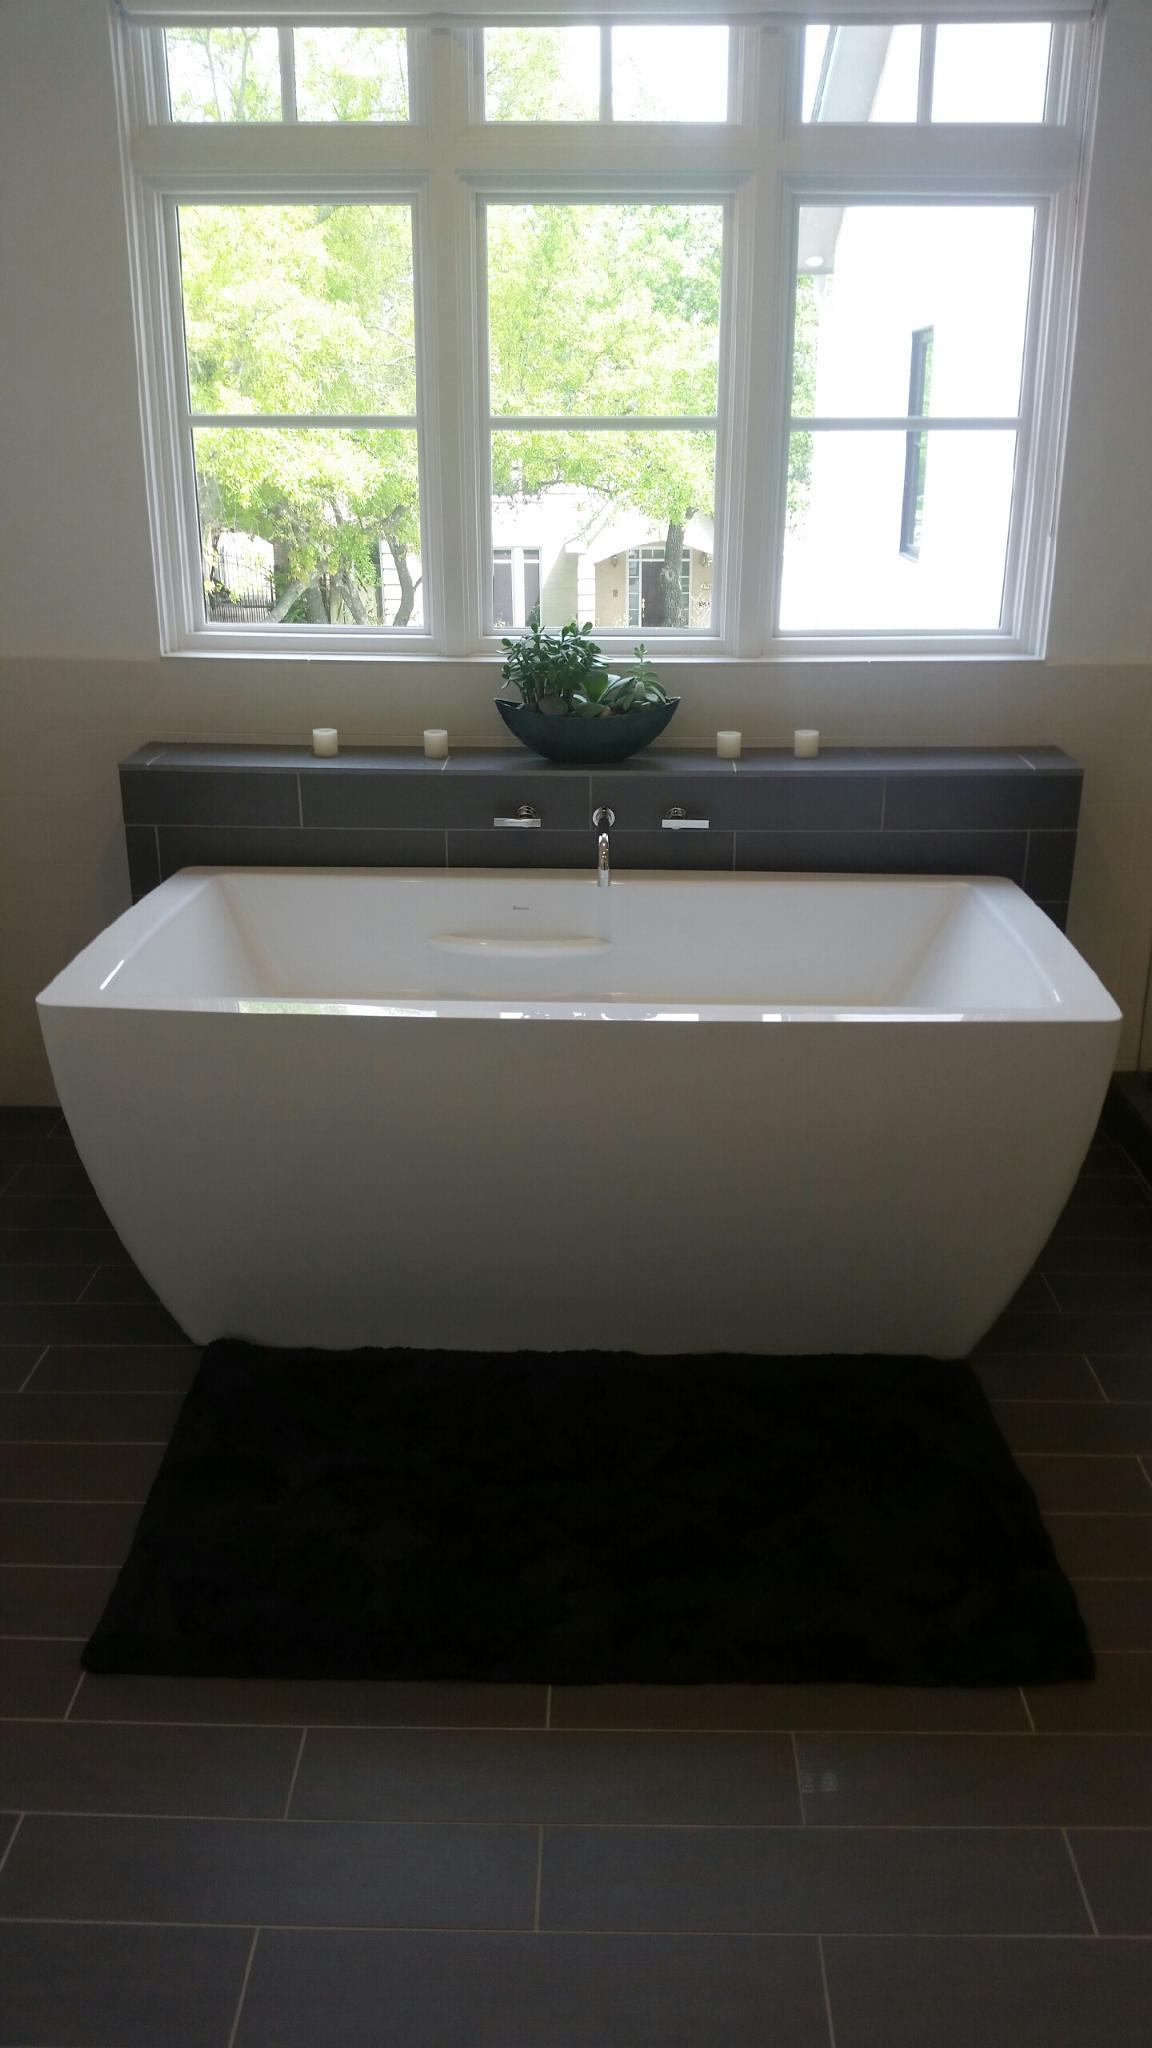 Master Bath Tub & Faucet Install